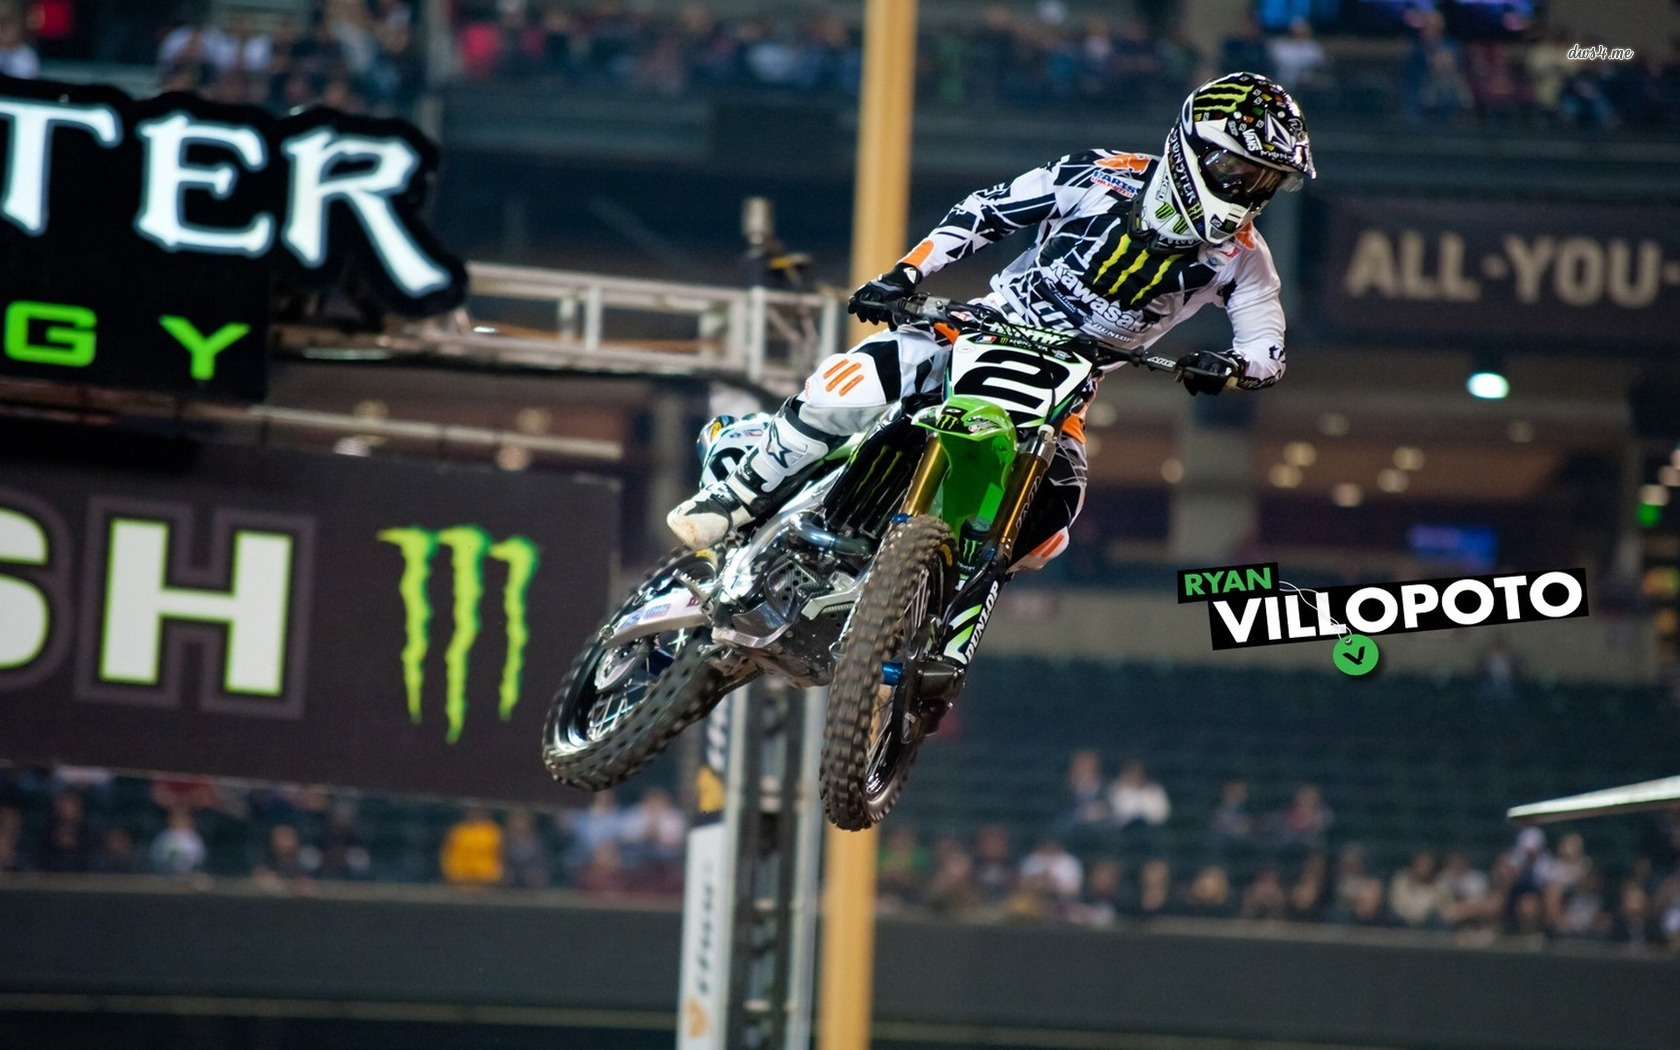 Ryan Villopoto wallpaper   Sport wallpapers   26355 1680x1050